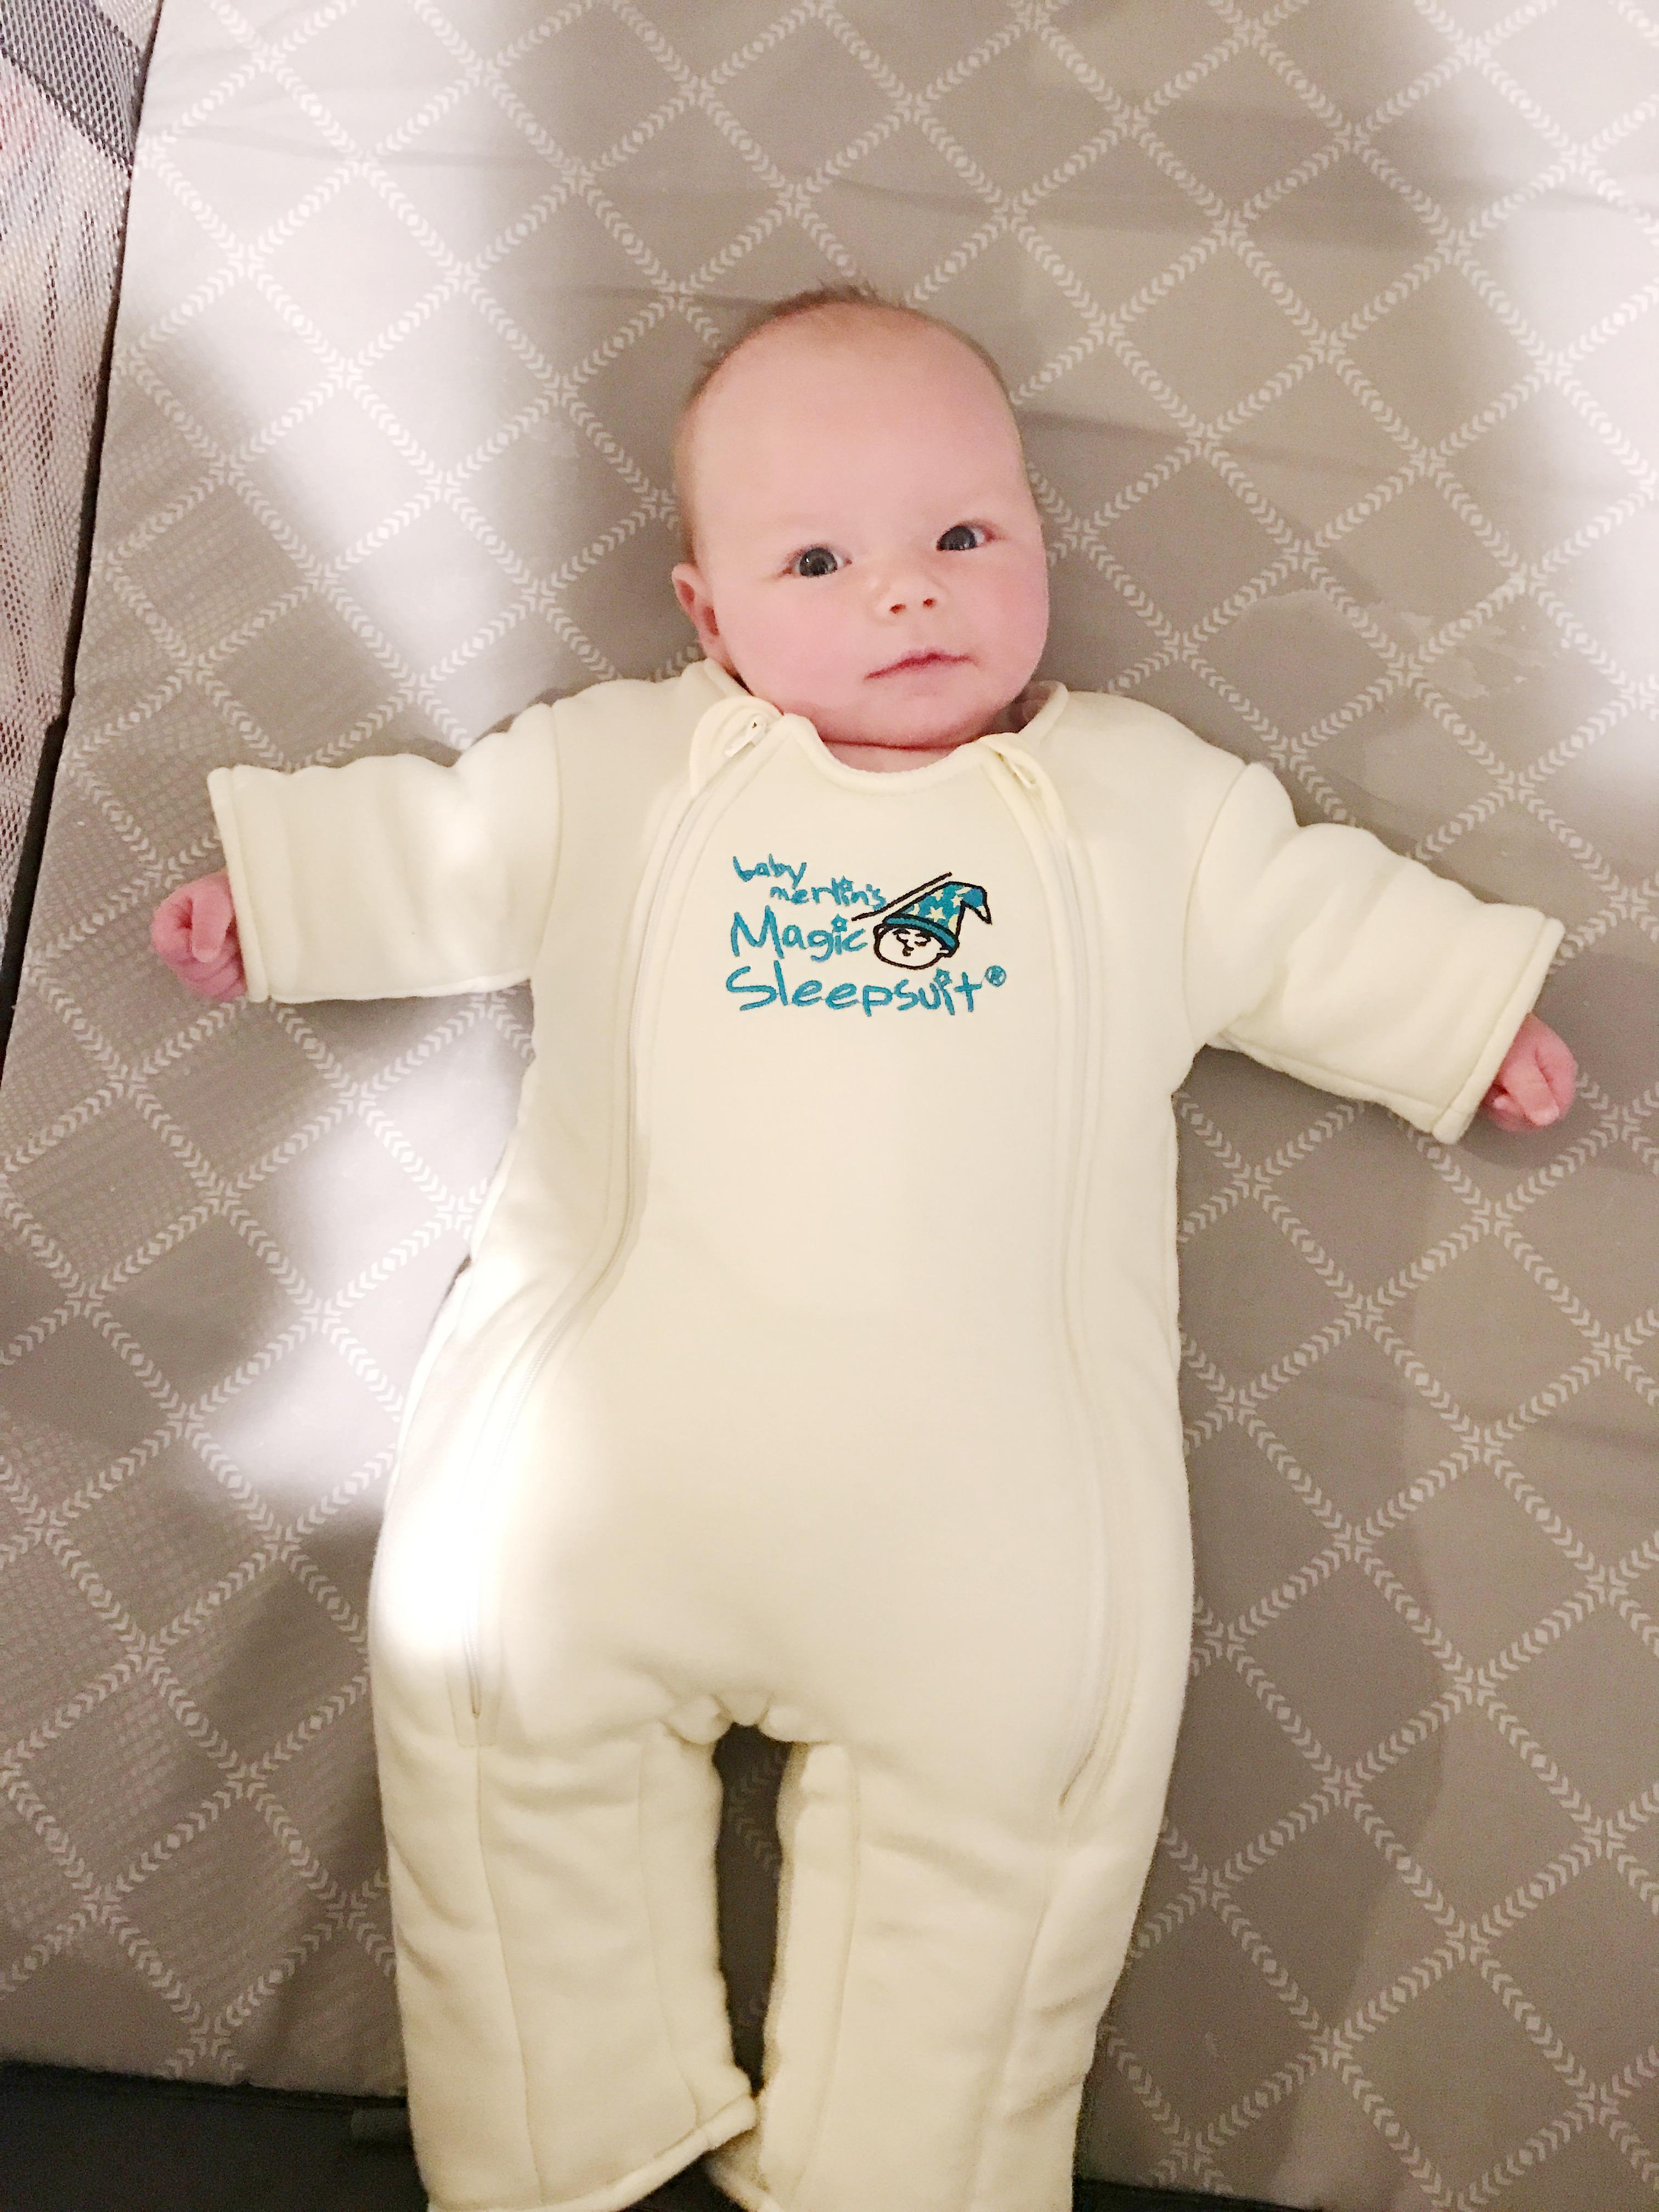 Baby Emma Larkin